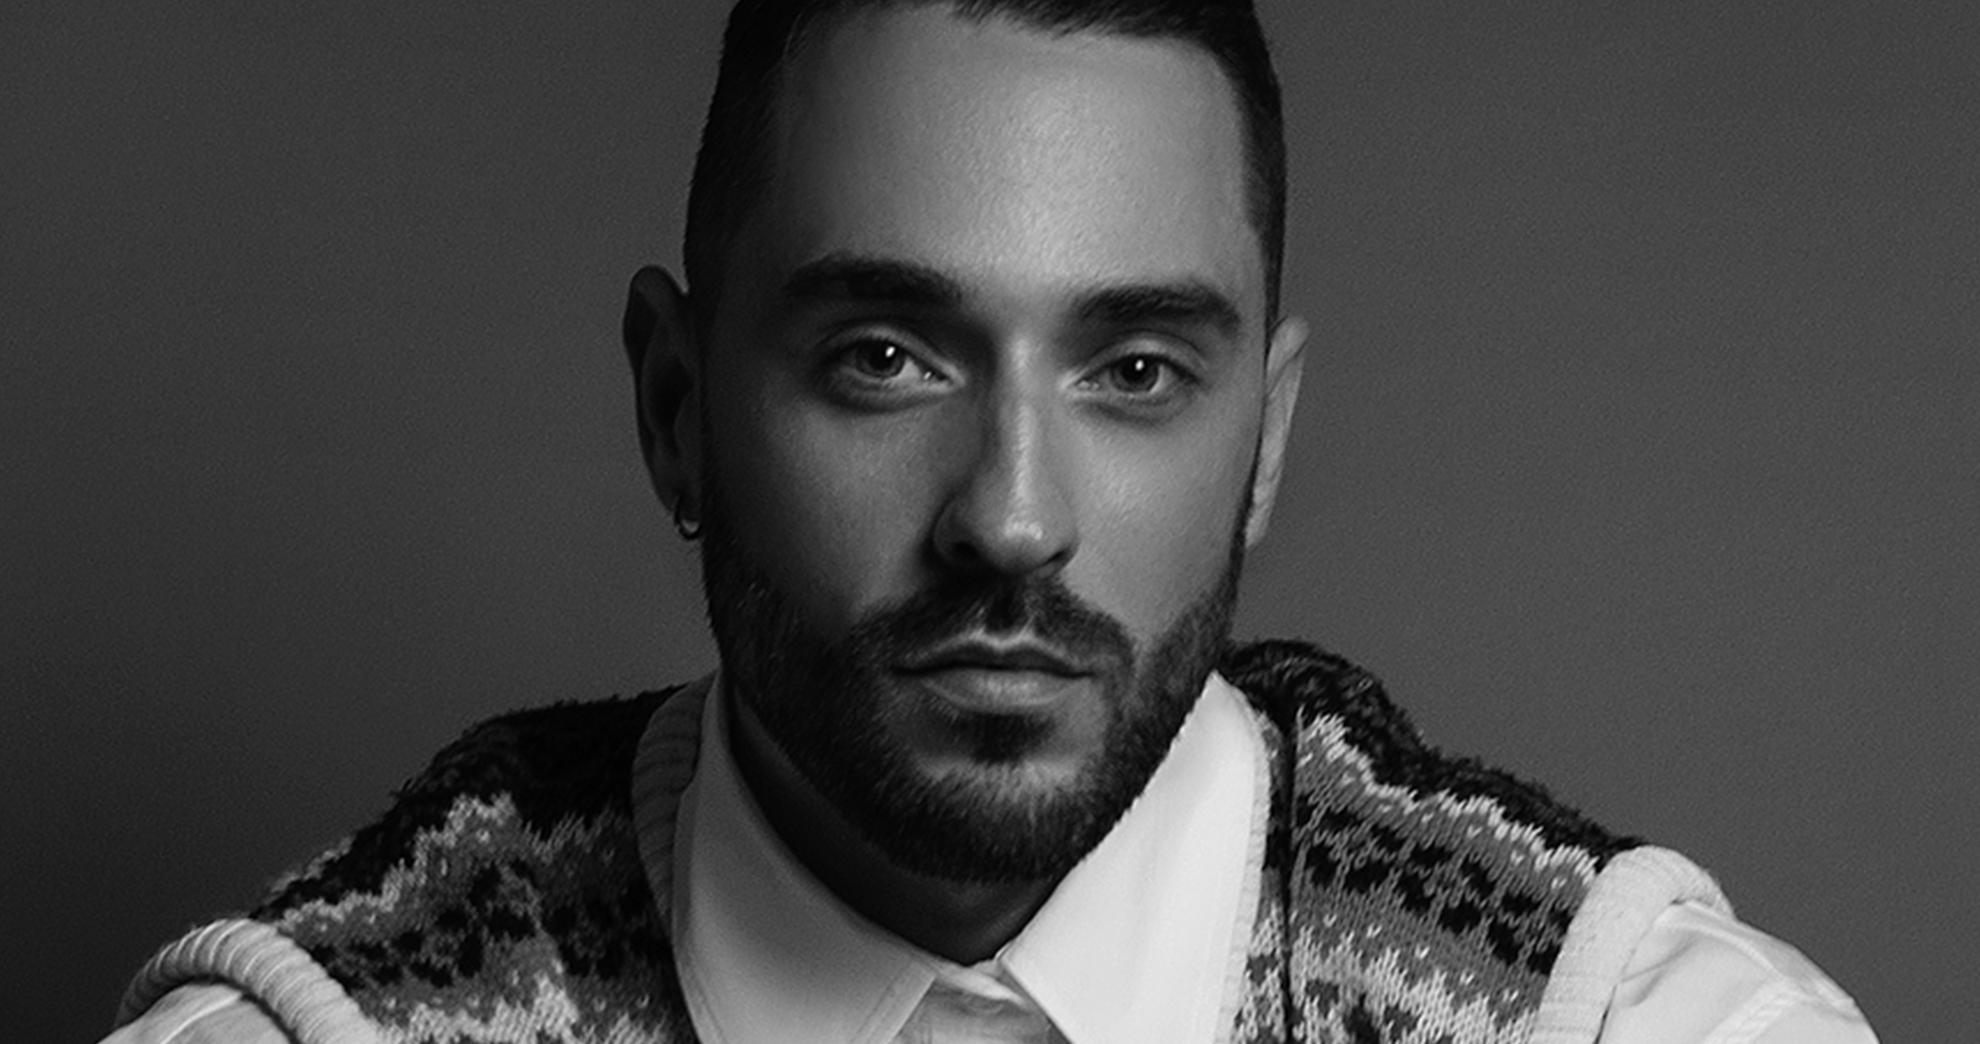 Christian_Rodriguez